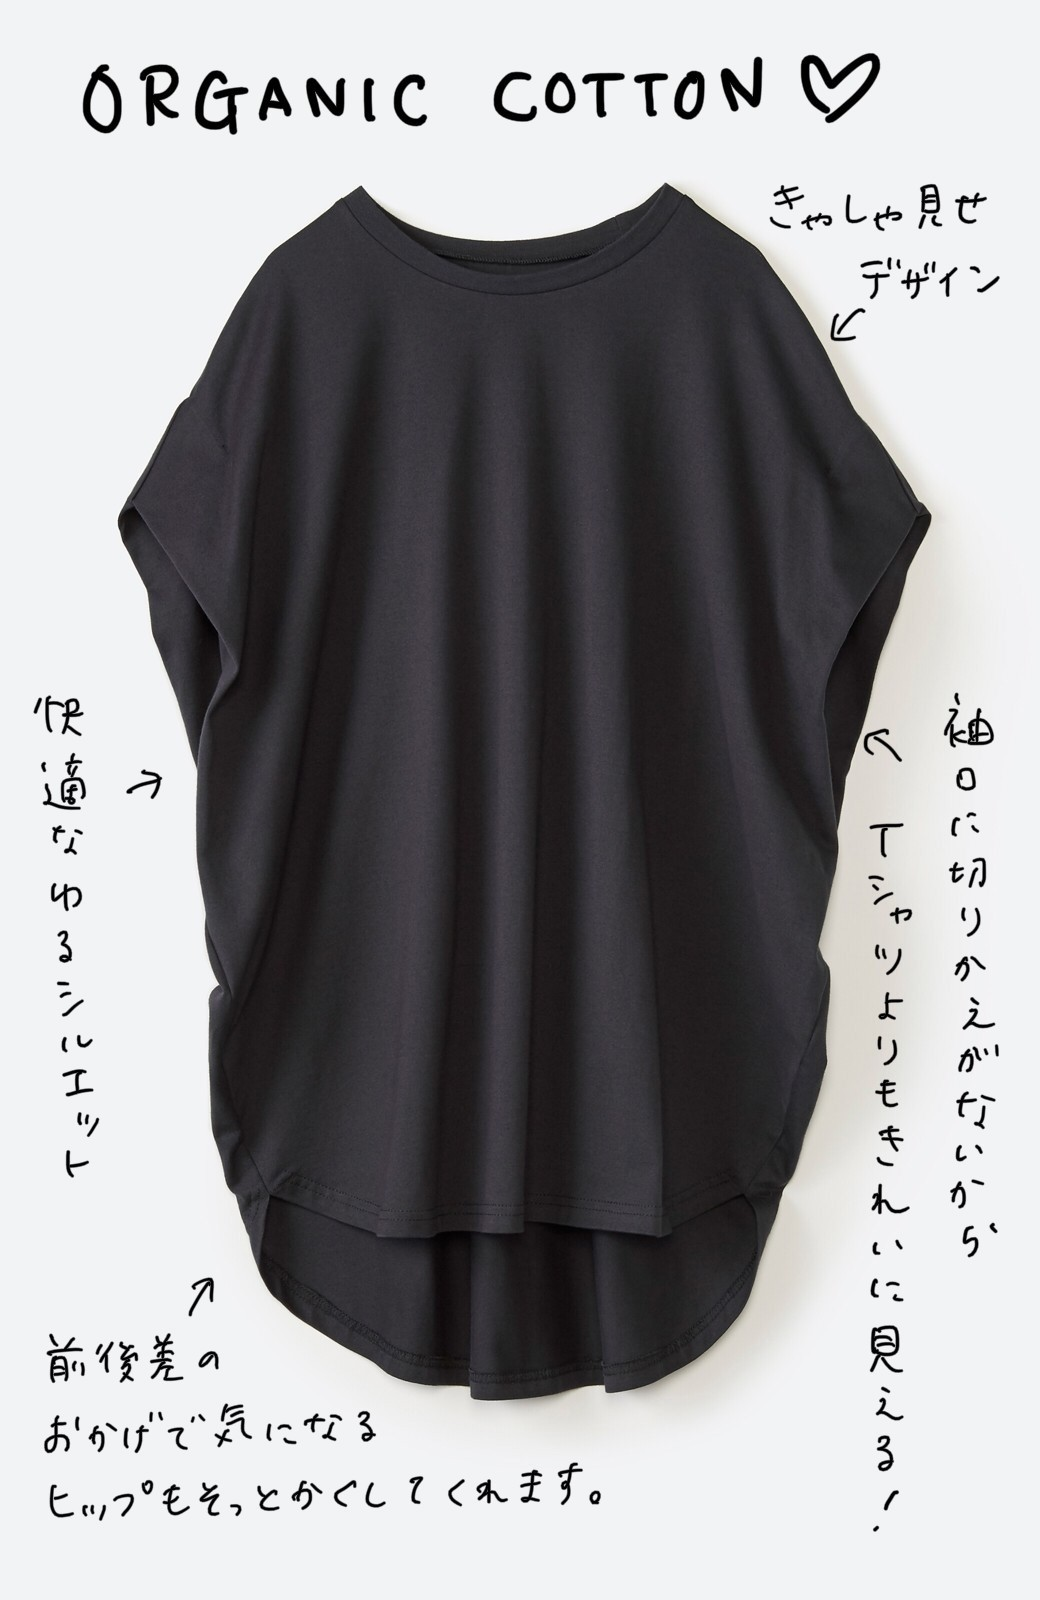 haco! PBPオーガニックコットン 楽ちんなのにブラウス気分で着られる大人のおめかしTシャツ <チャコールグレー>の商品写真2